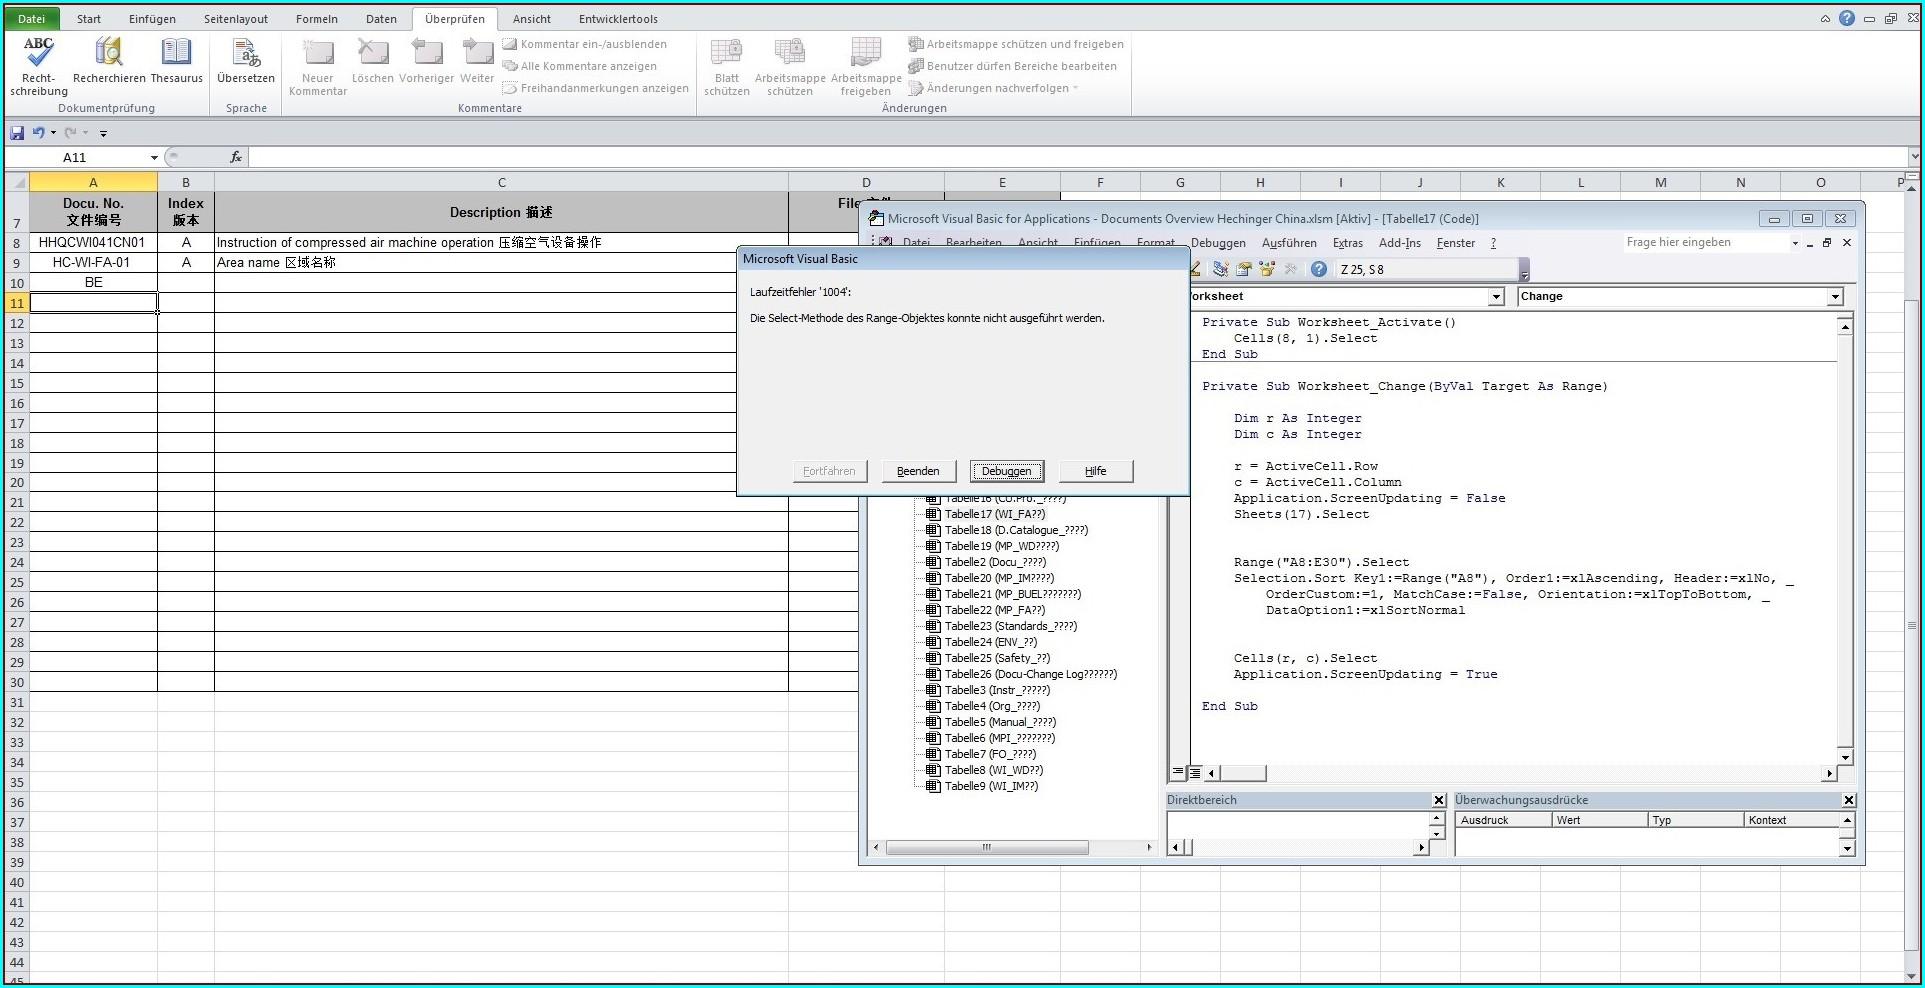 Excel Vba Sort Key Range